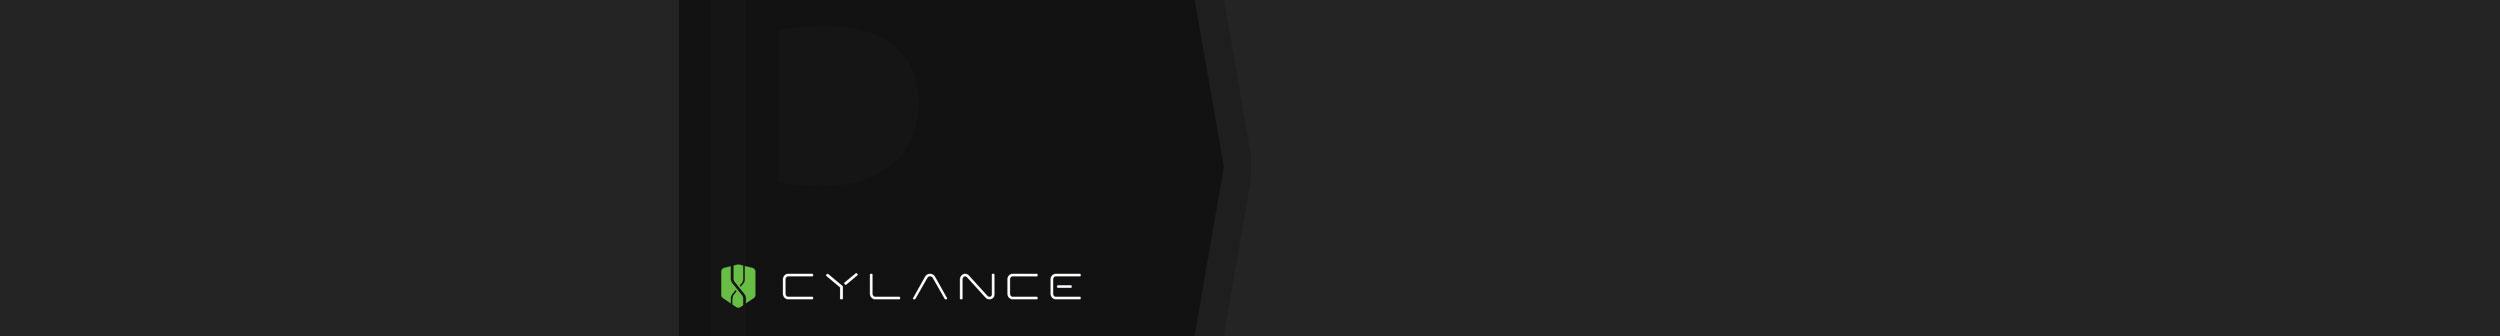 infosecpartners-slider-cylance3